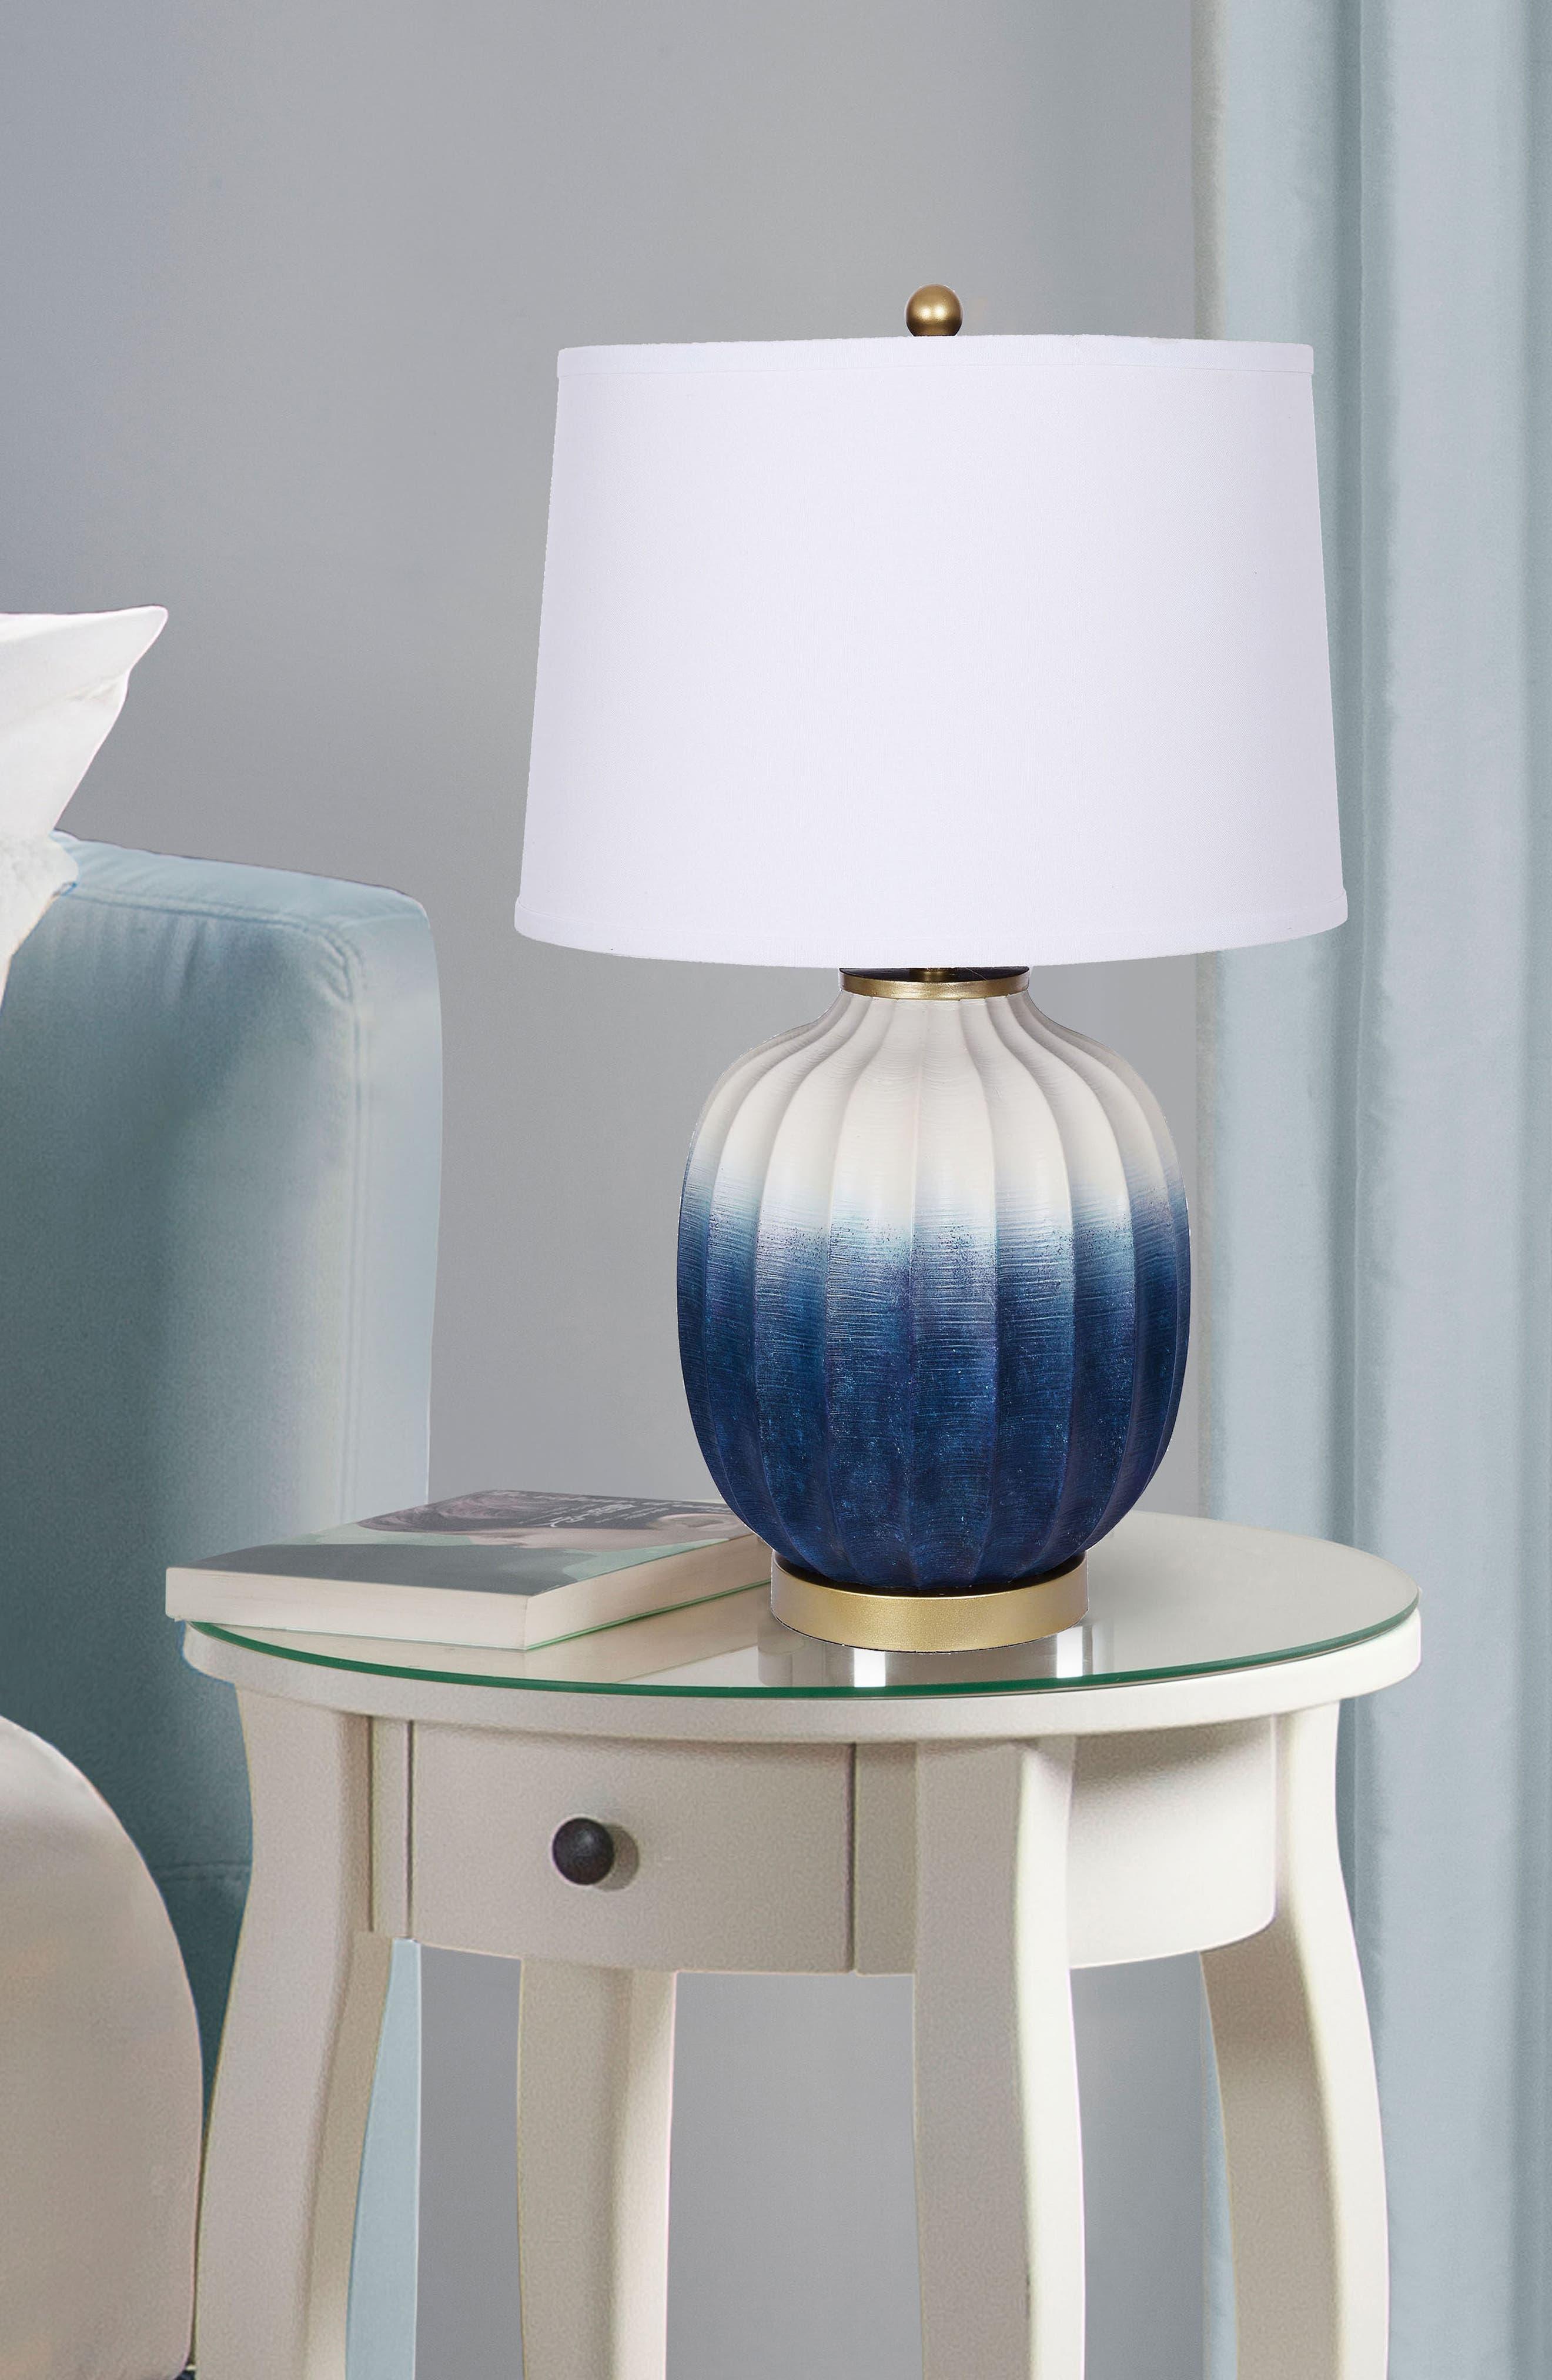 JALEXANDER LIGHTING,                             JAlexander Ombré Table Lamp,                             Alternate thumbnail 2, color,                             400